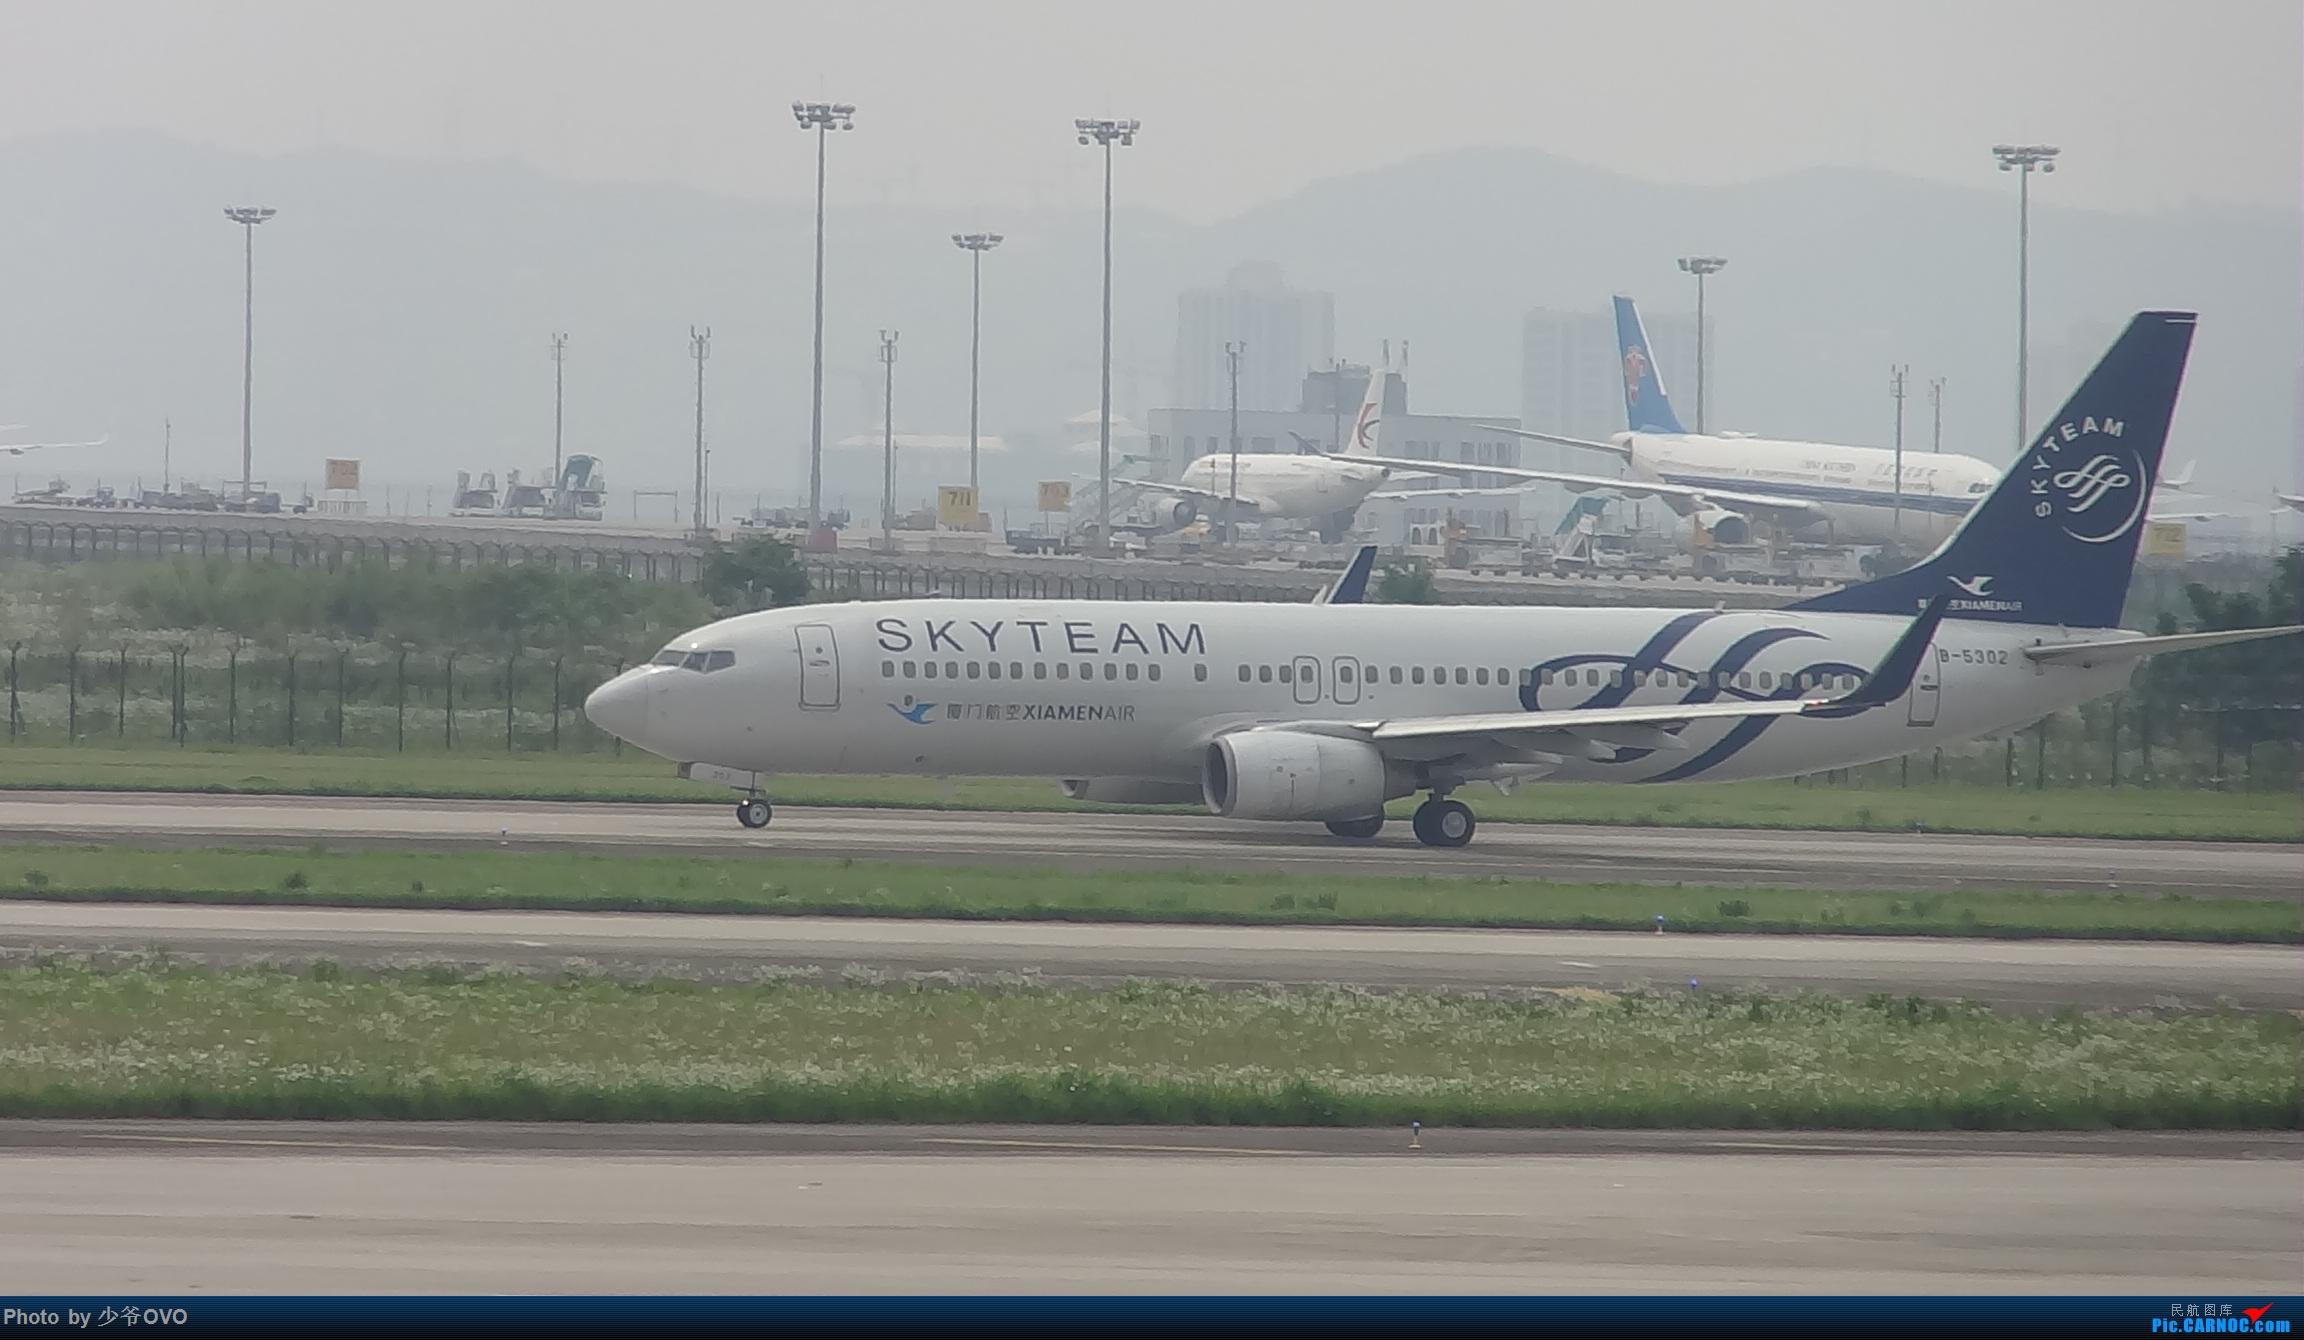 Re:[原创]CKG重庆江北机场拍机,国航744,B-2447,和一群大佬拍机 BOEING 737-800 B-5302 中国重庆江北国际机场